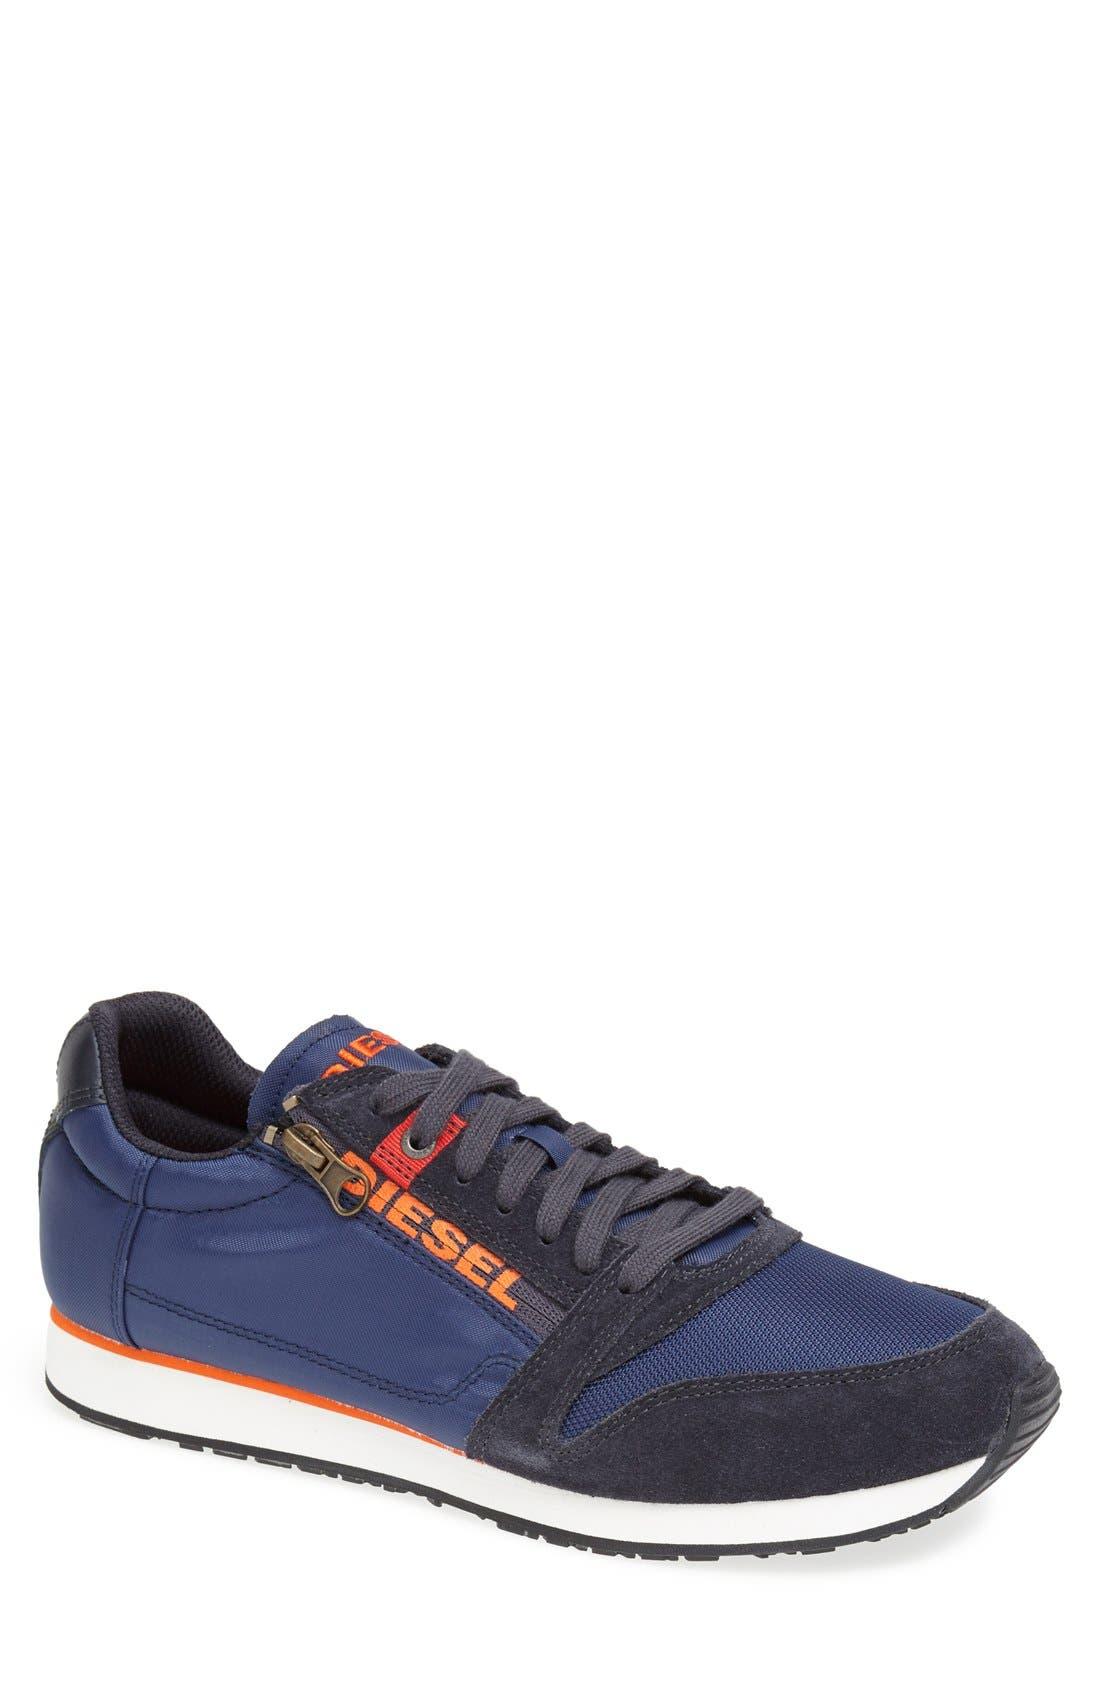 'Black Jake Slocker' Sneaker, Main, color, 400